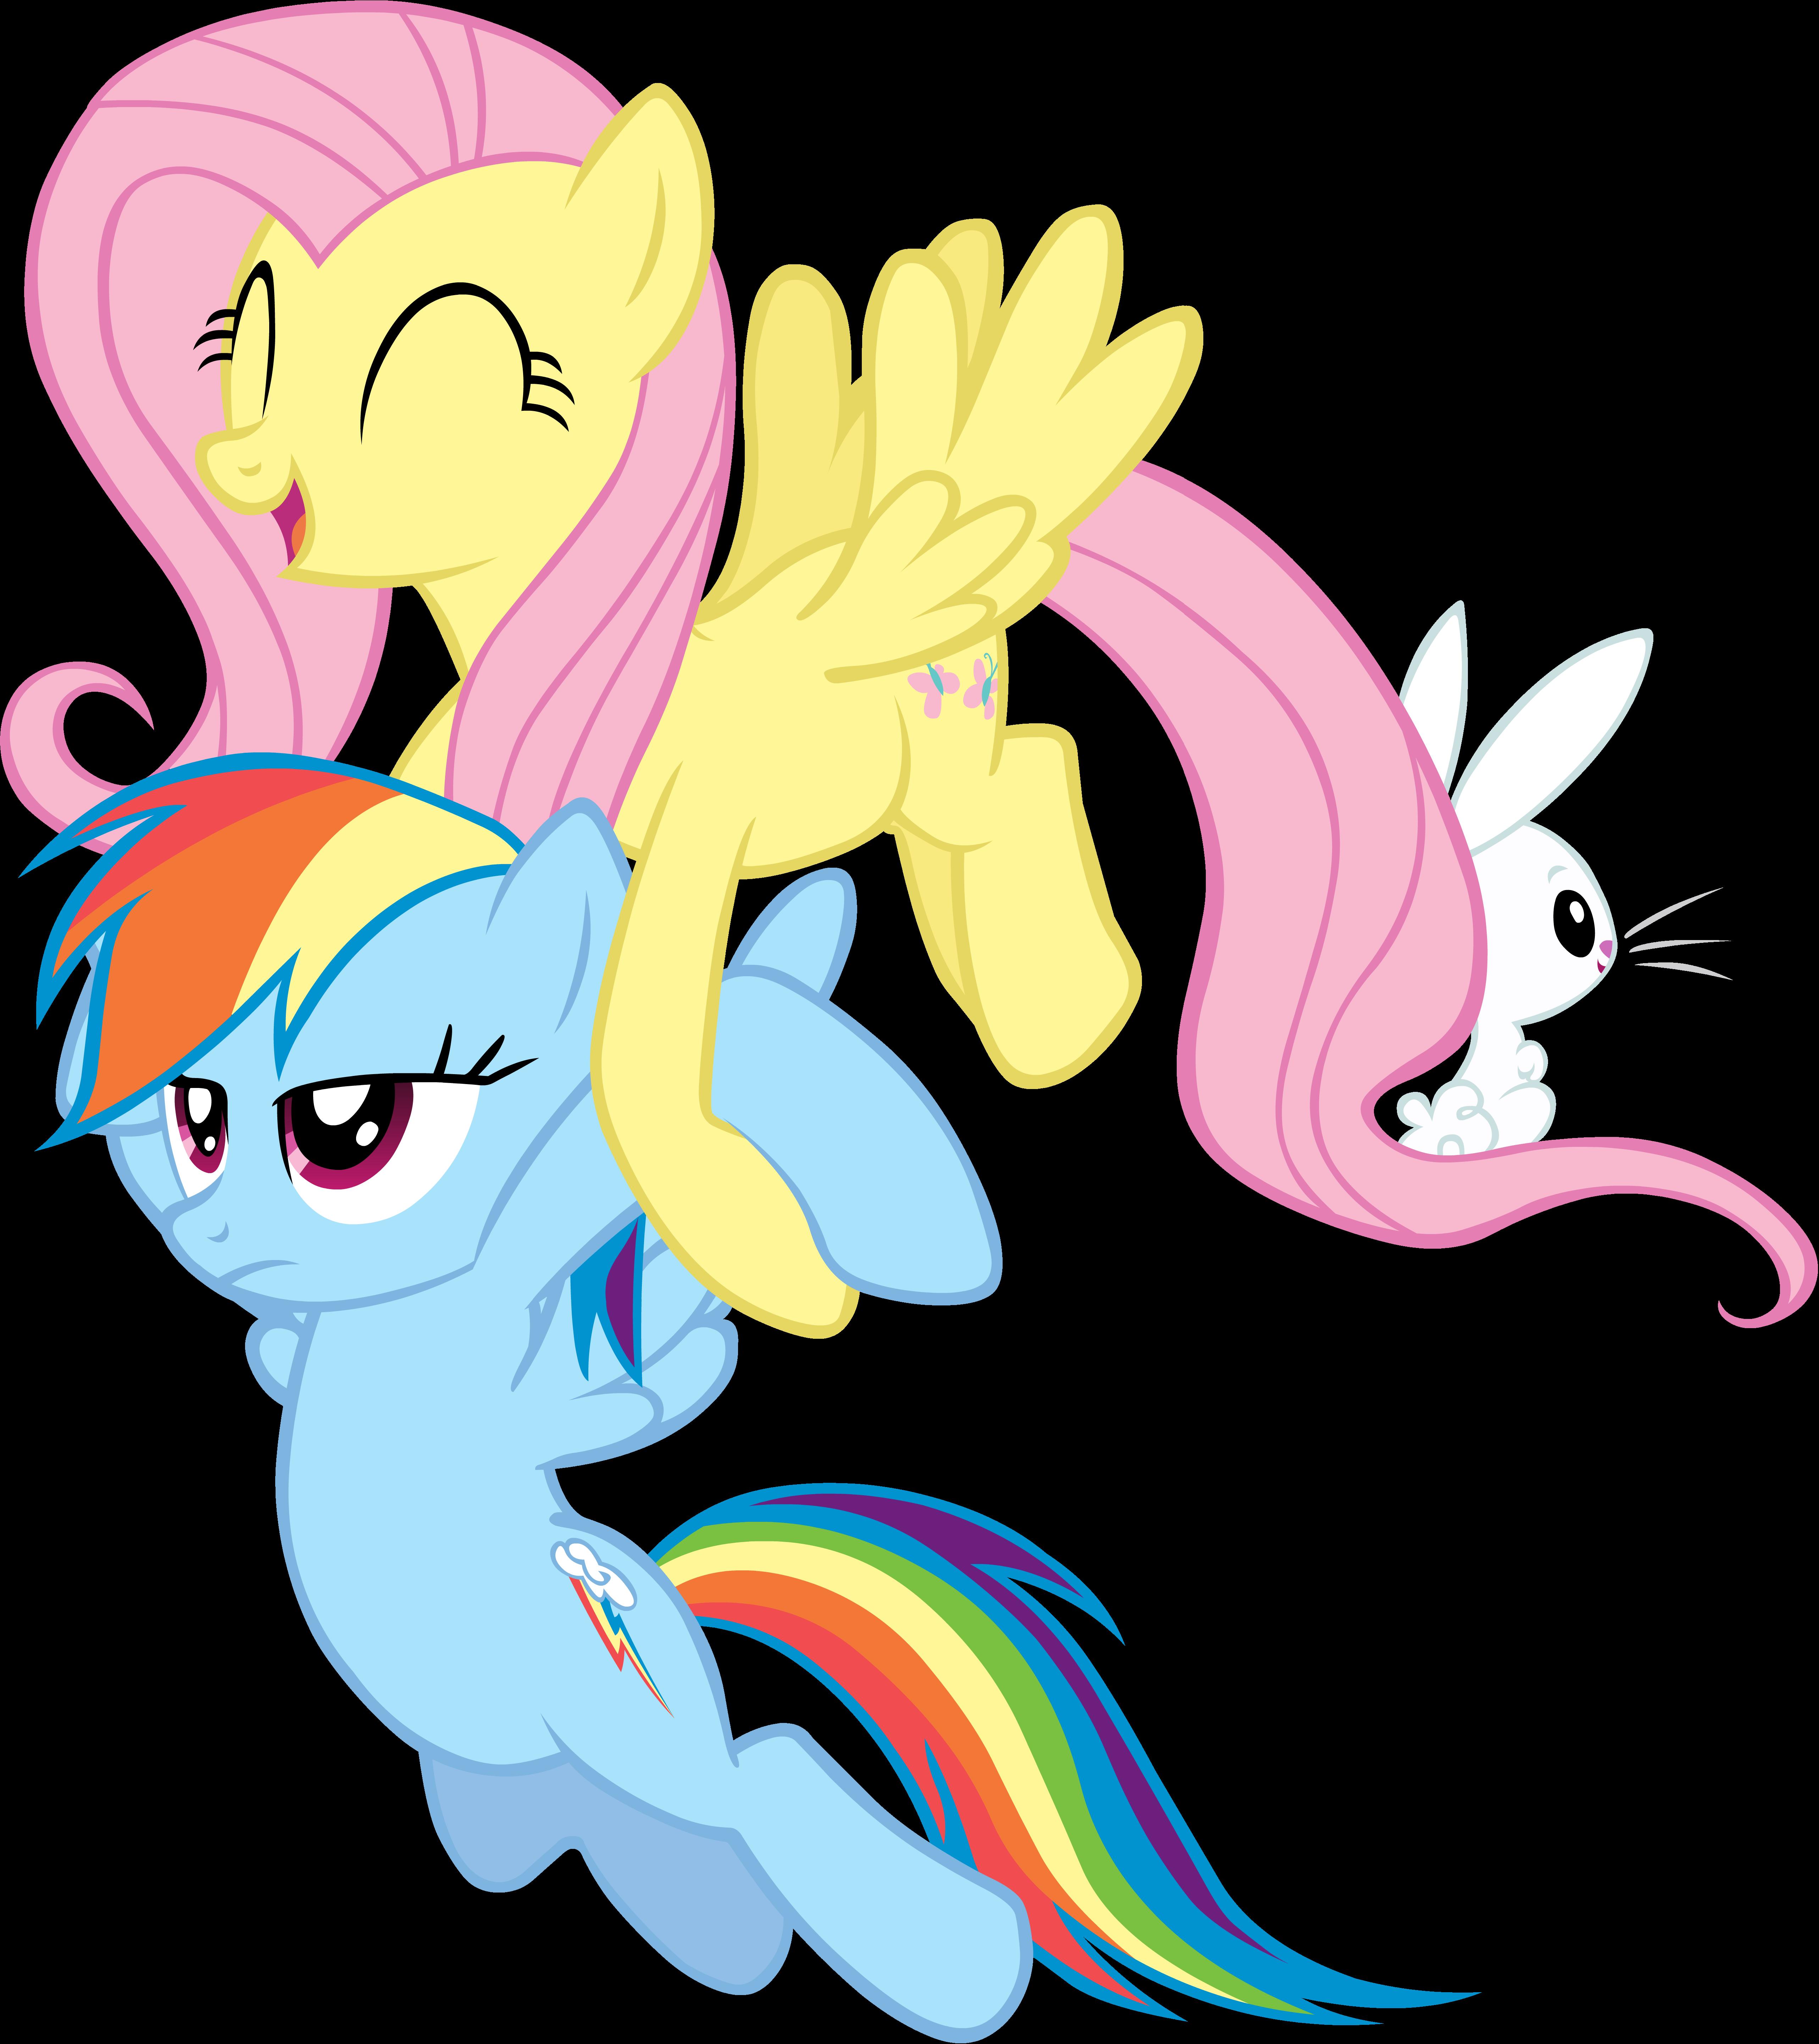 Fluttershy carrying Rainbow Dash Vector